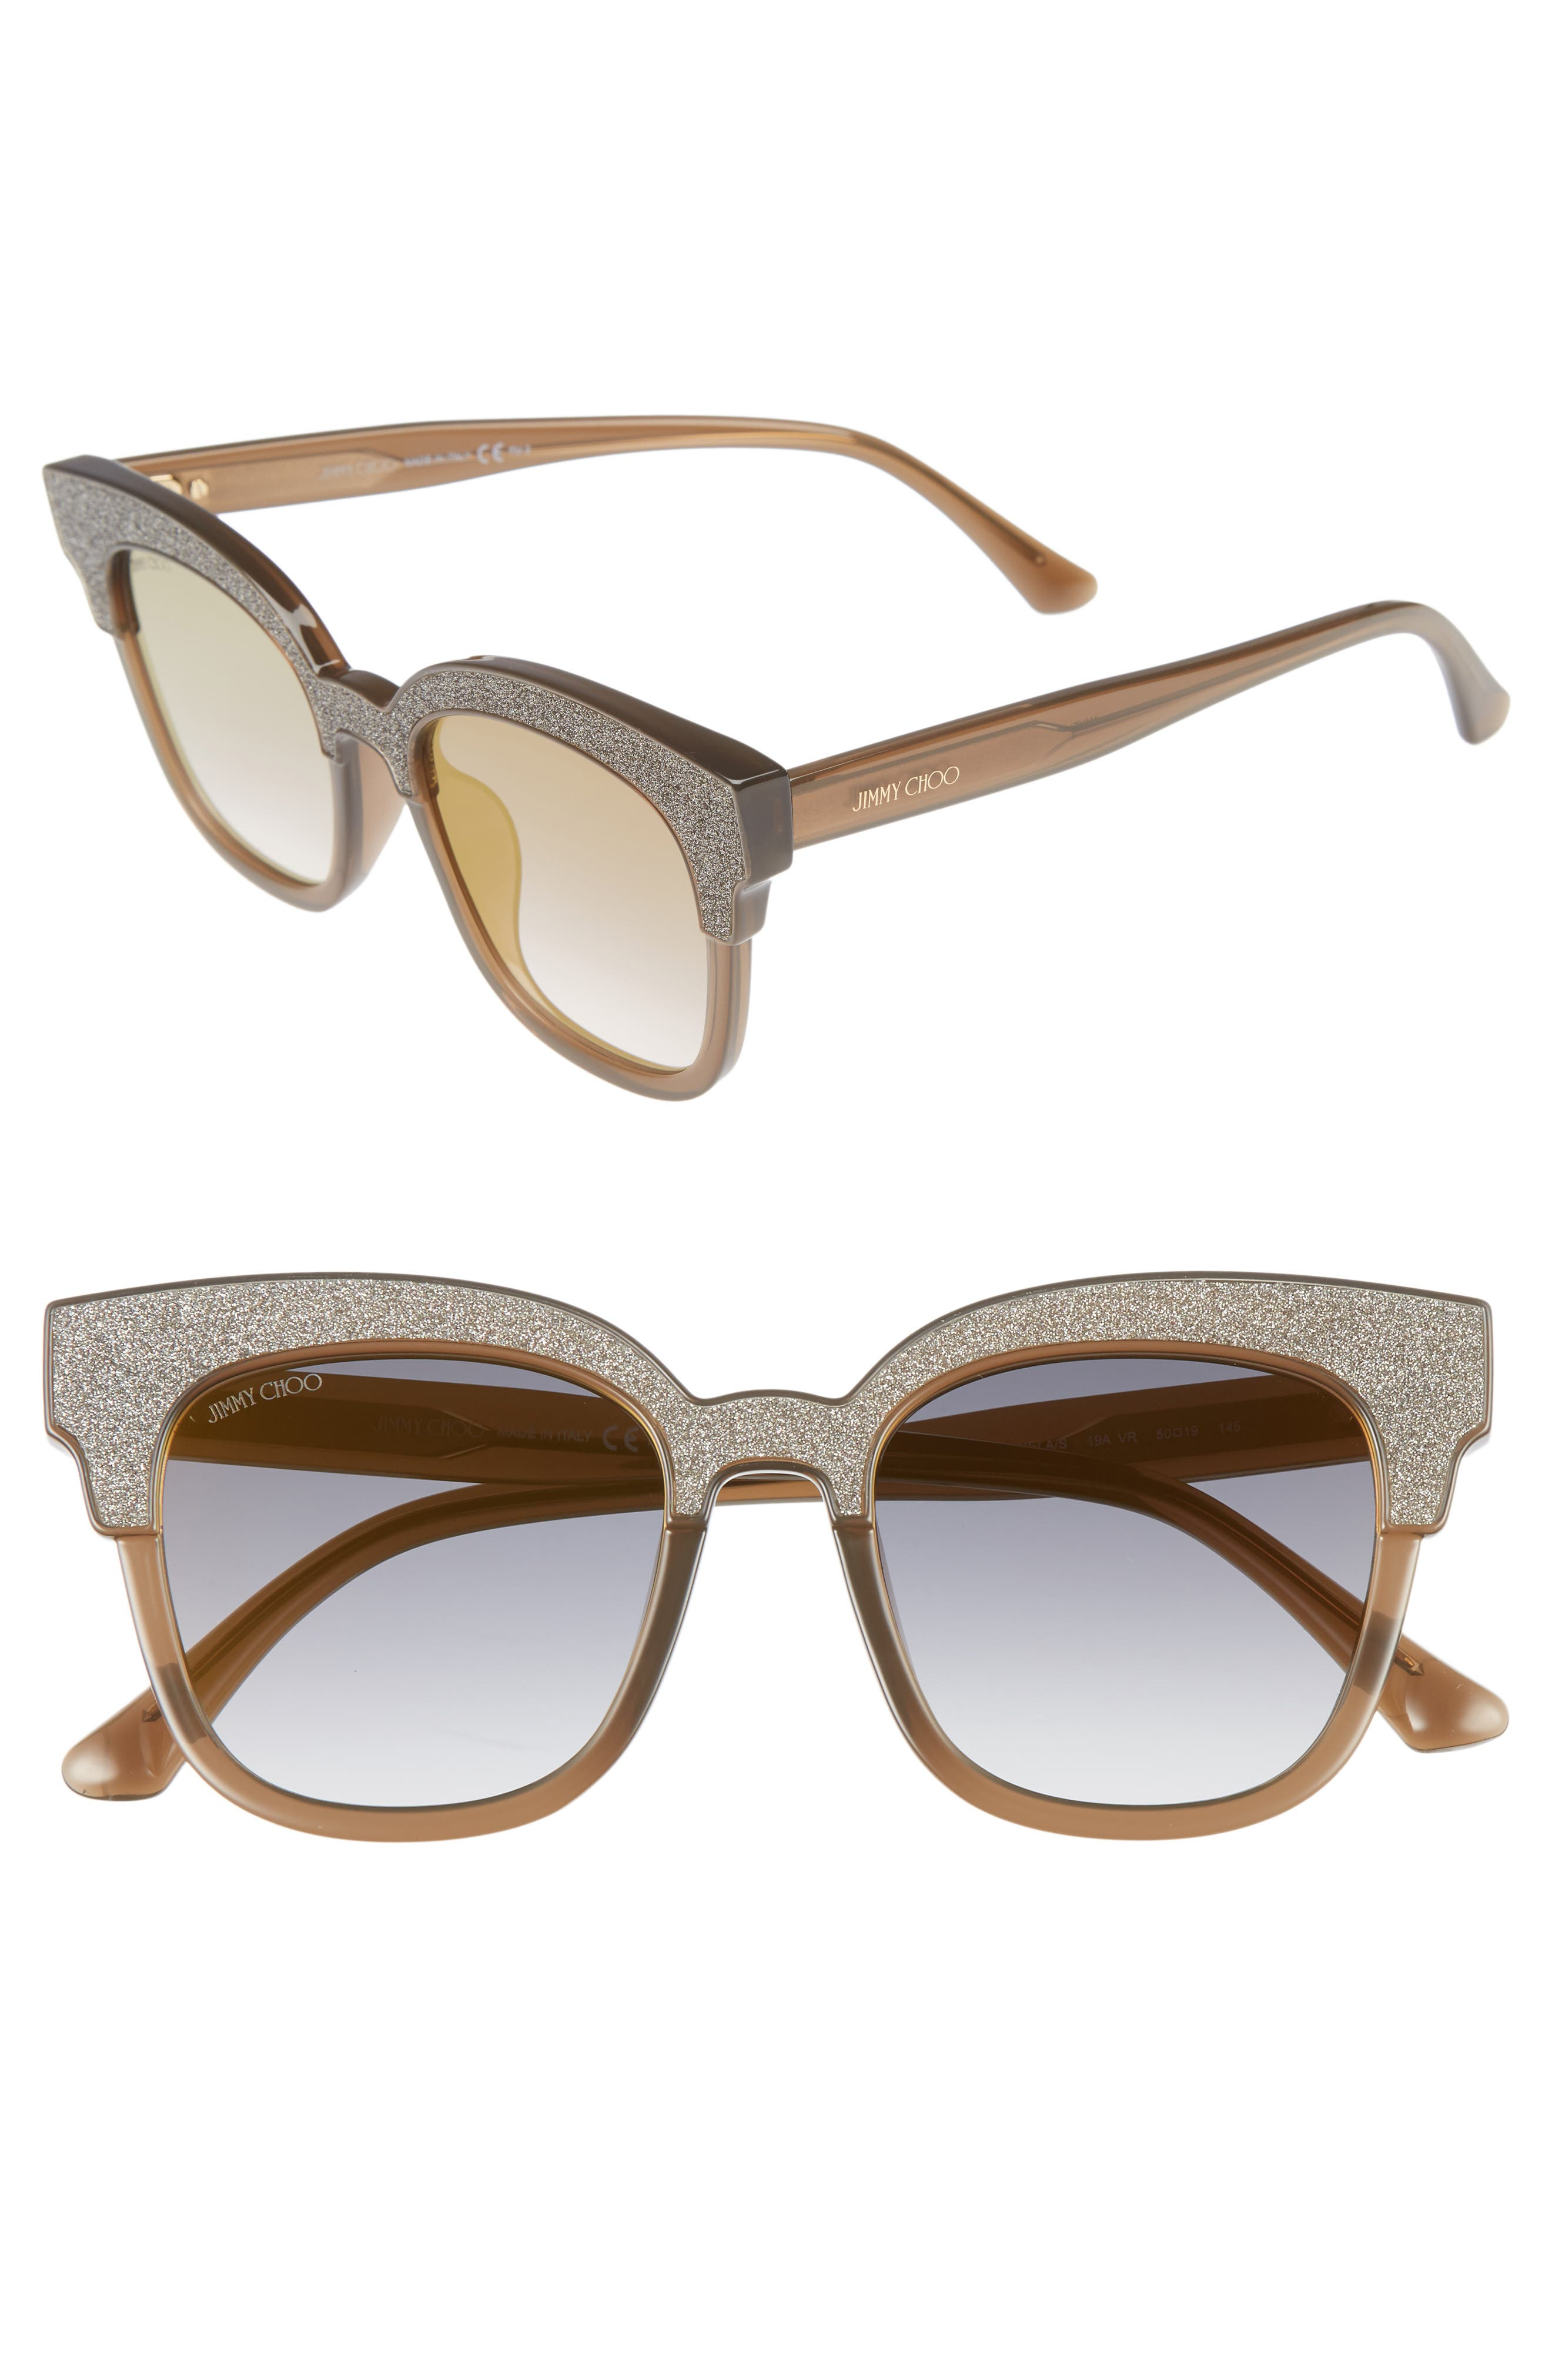 Alternate Image 1 Selected - Jimmy Choo Mayelas 50mm Cat Eye Sunglasses